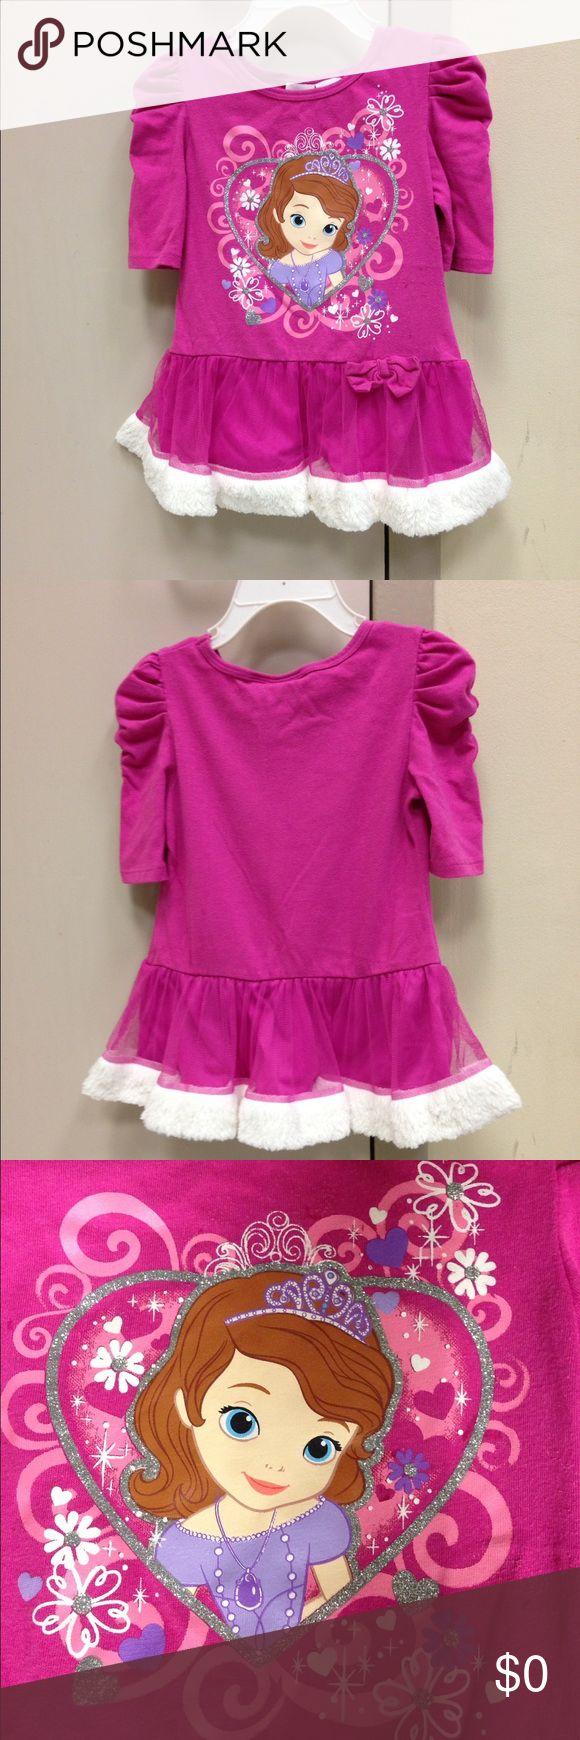 🌴NEW LISTING🌴 Disney Sophia Dress Pink.  Few tiny glue spots I cannot remove (see pic 5). Size 4T. (2/26) Disney Dresses Casual